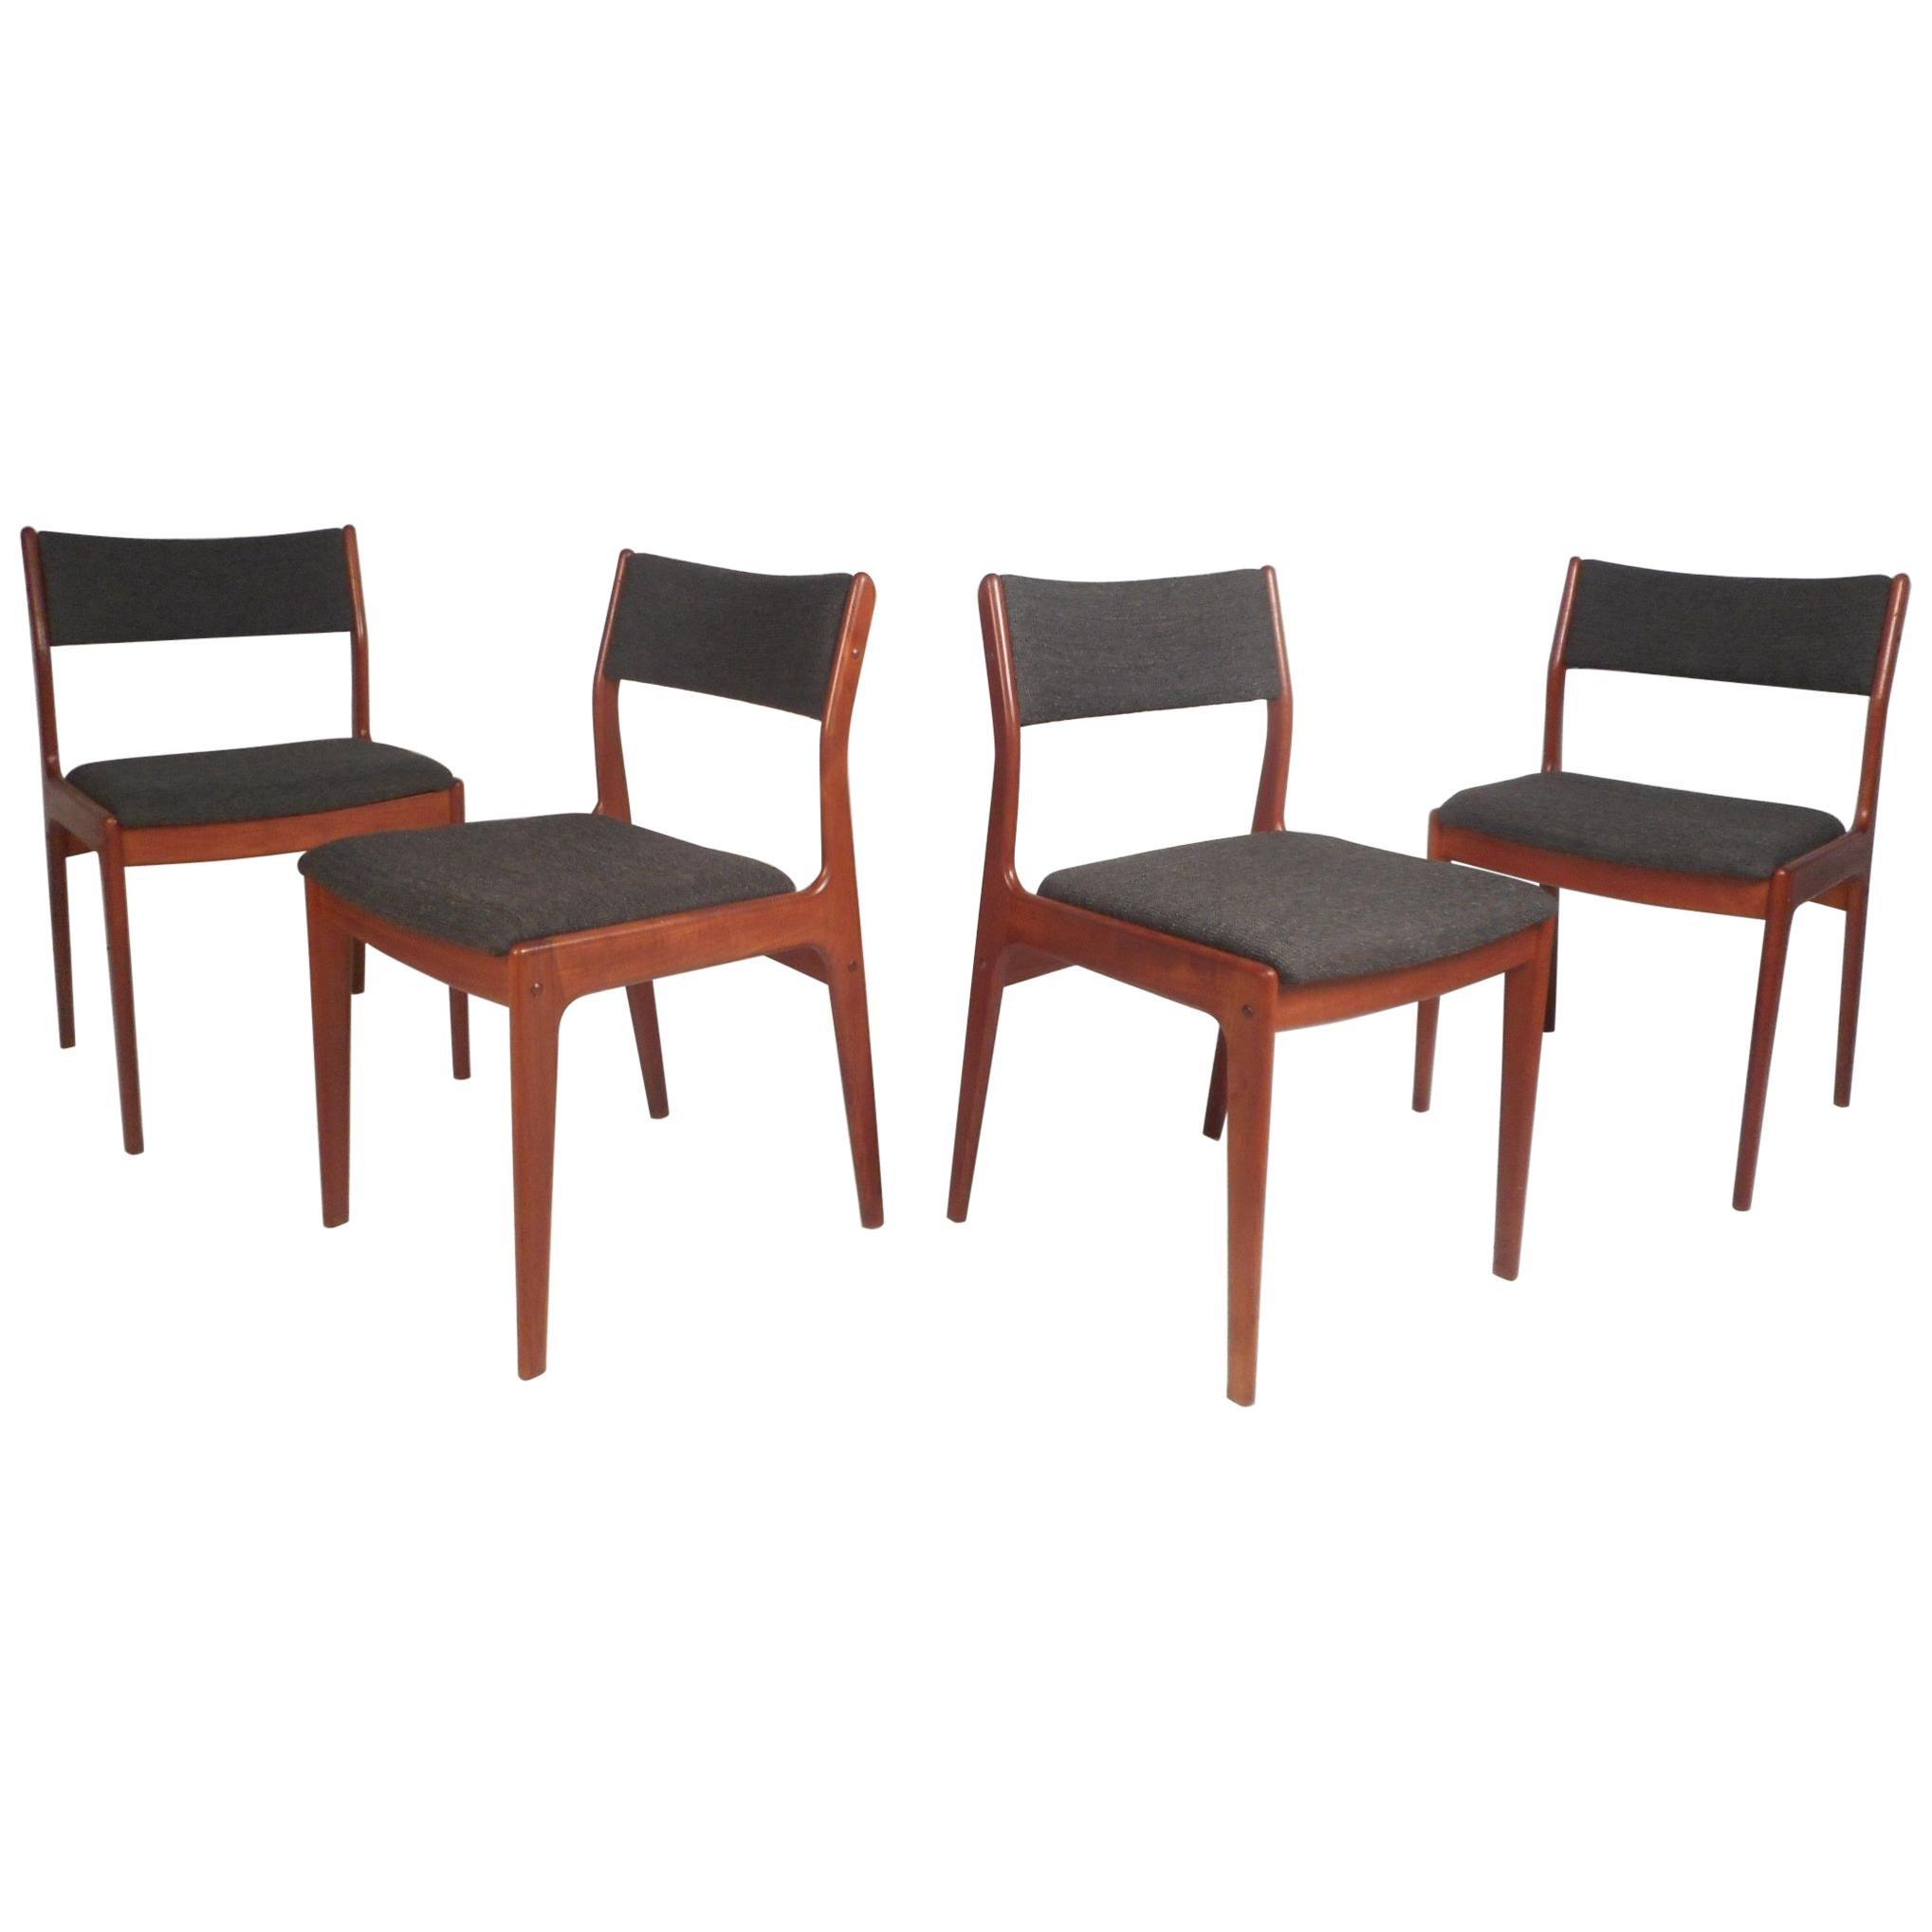 set of four mid century modern danish teak dining chairs for sale at rh 1stdibs com mid century modern danish teak coffee table mid century modern danish teak dining table